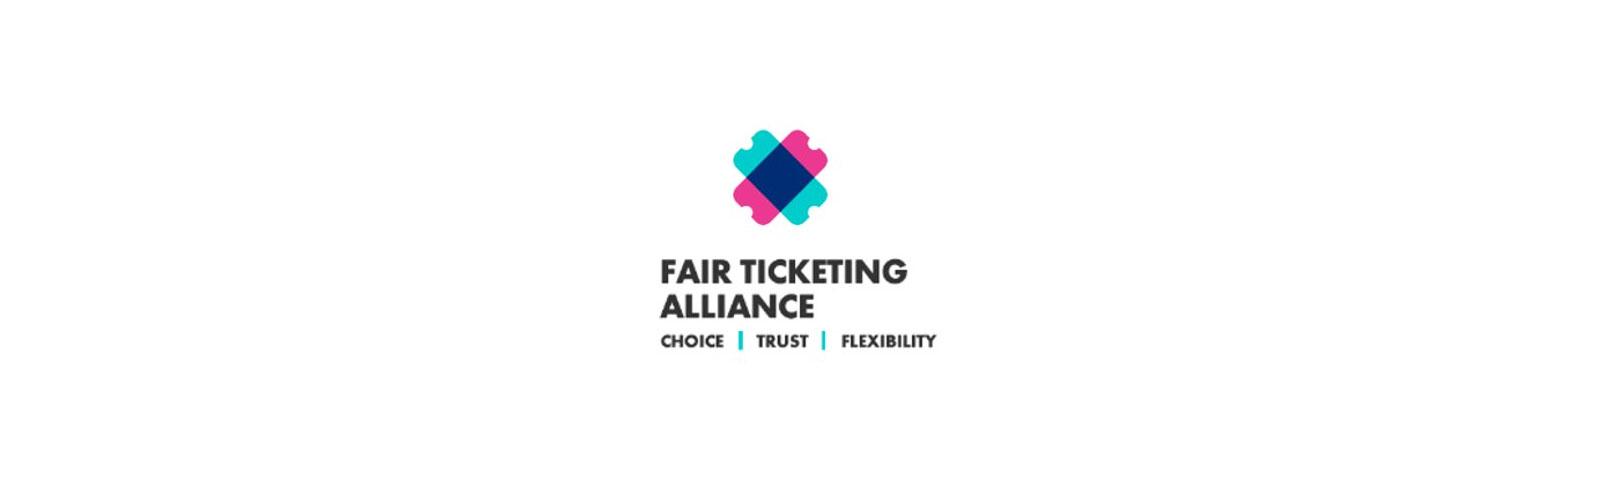 Fair-Ticketing-Alliance